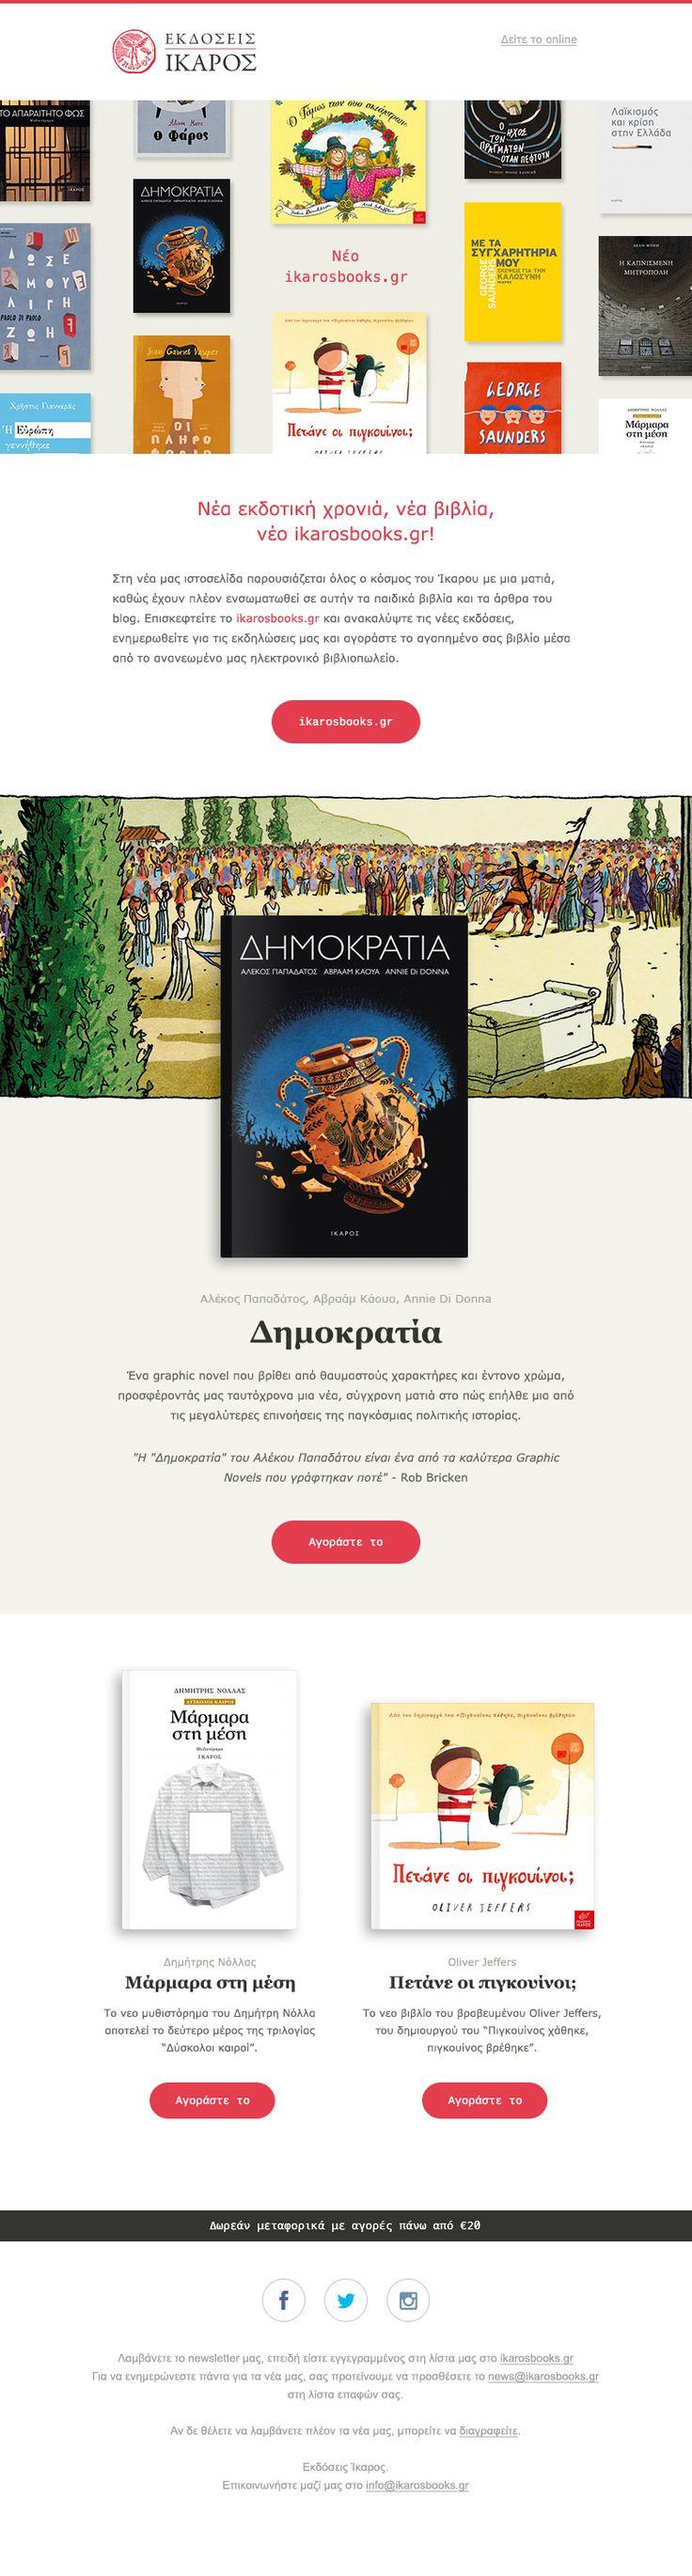 Ikaros Books Newsletter - Νέα εκδοτική χρονιά, νέα βιβλία, νέο ikarosbooks.gr!